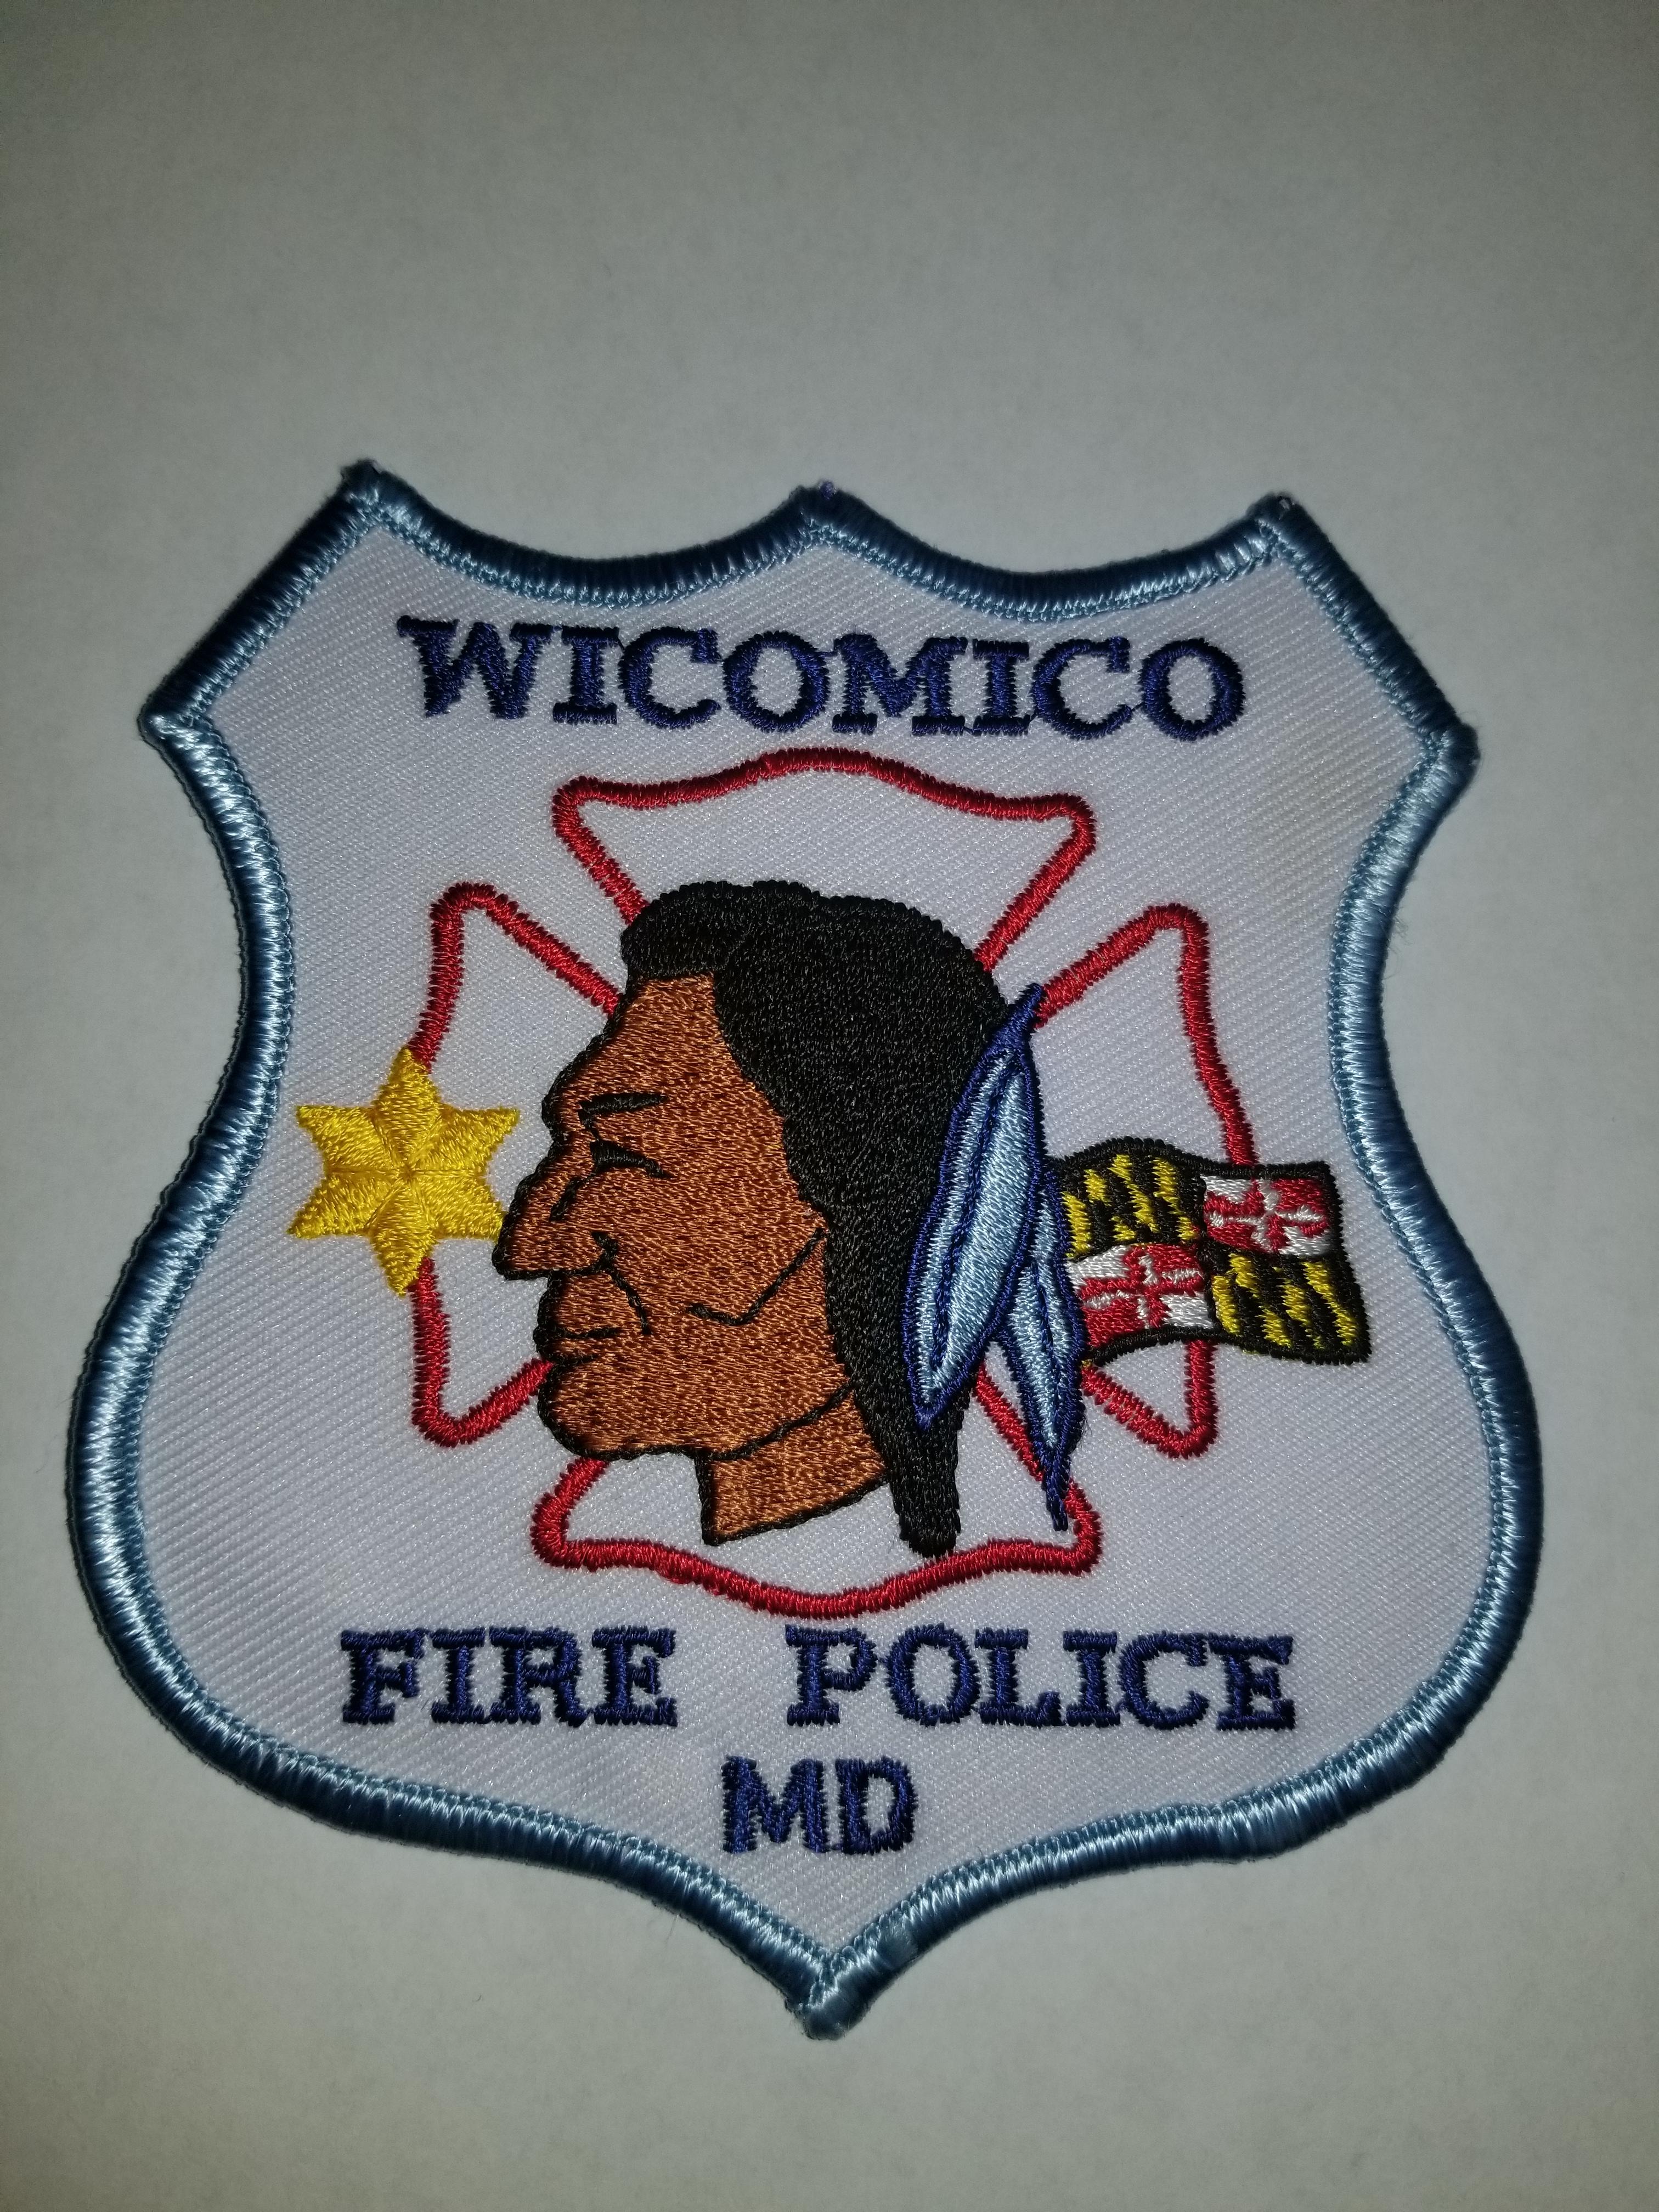 Wicomico Fire Police MD